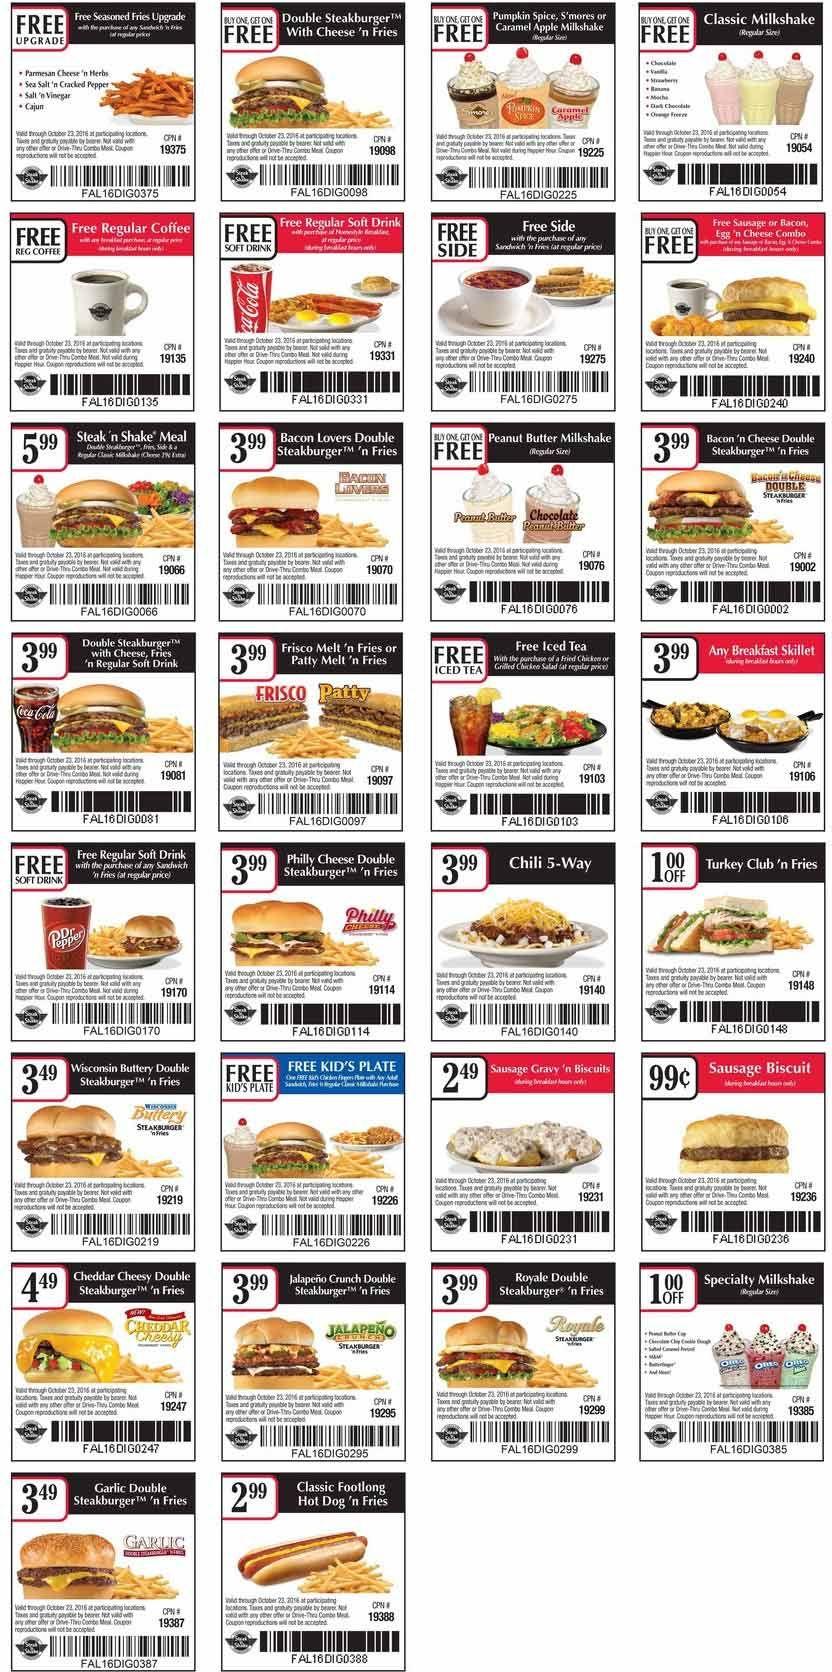 Pinned September 6th Second Steakburger Meal Free More At Steak N Shake Steak N Shake Coupons Shakes Shopping Coupons